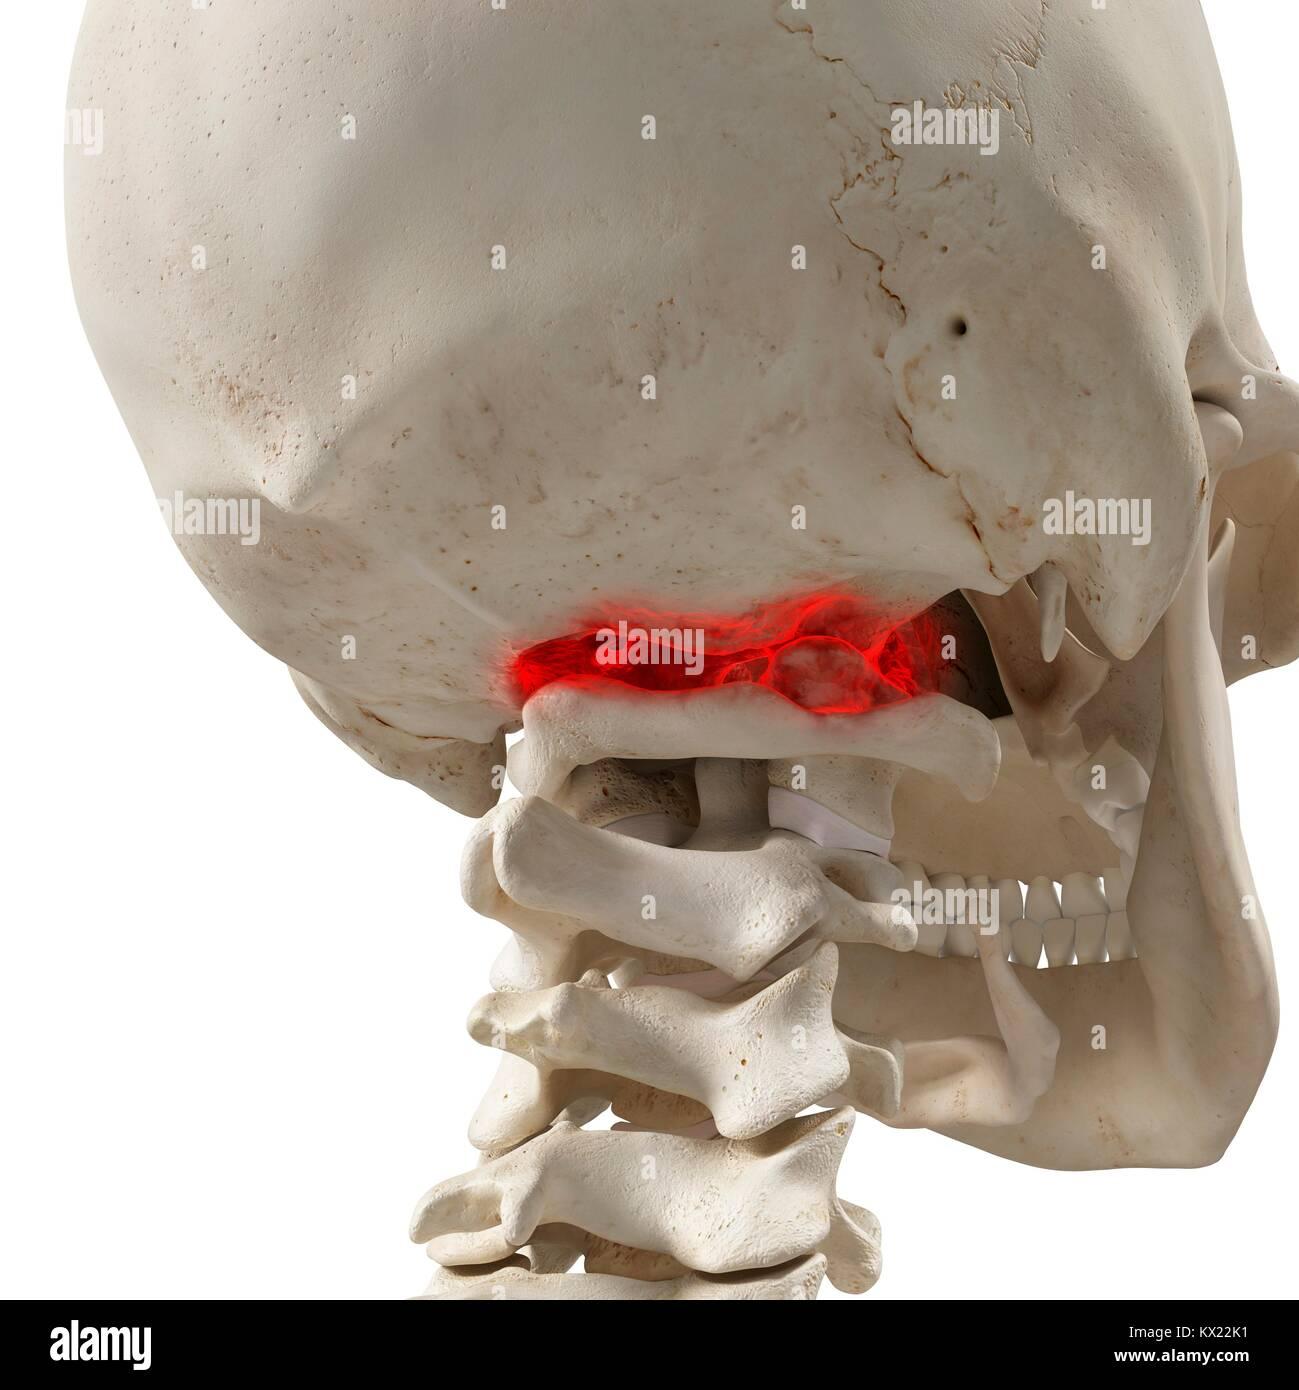 Arthritis in the atlas vertebrae, illustration. - Stock Image